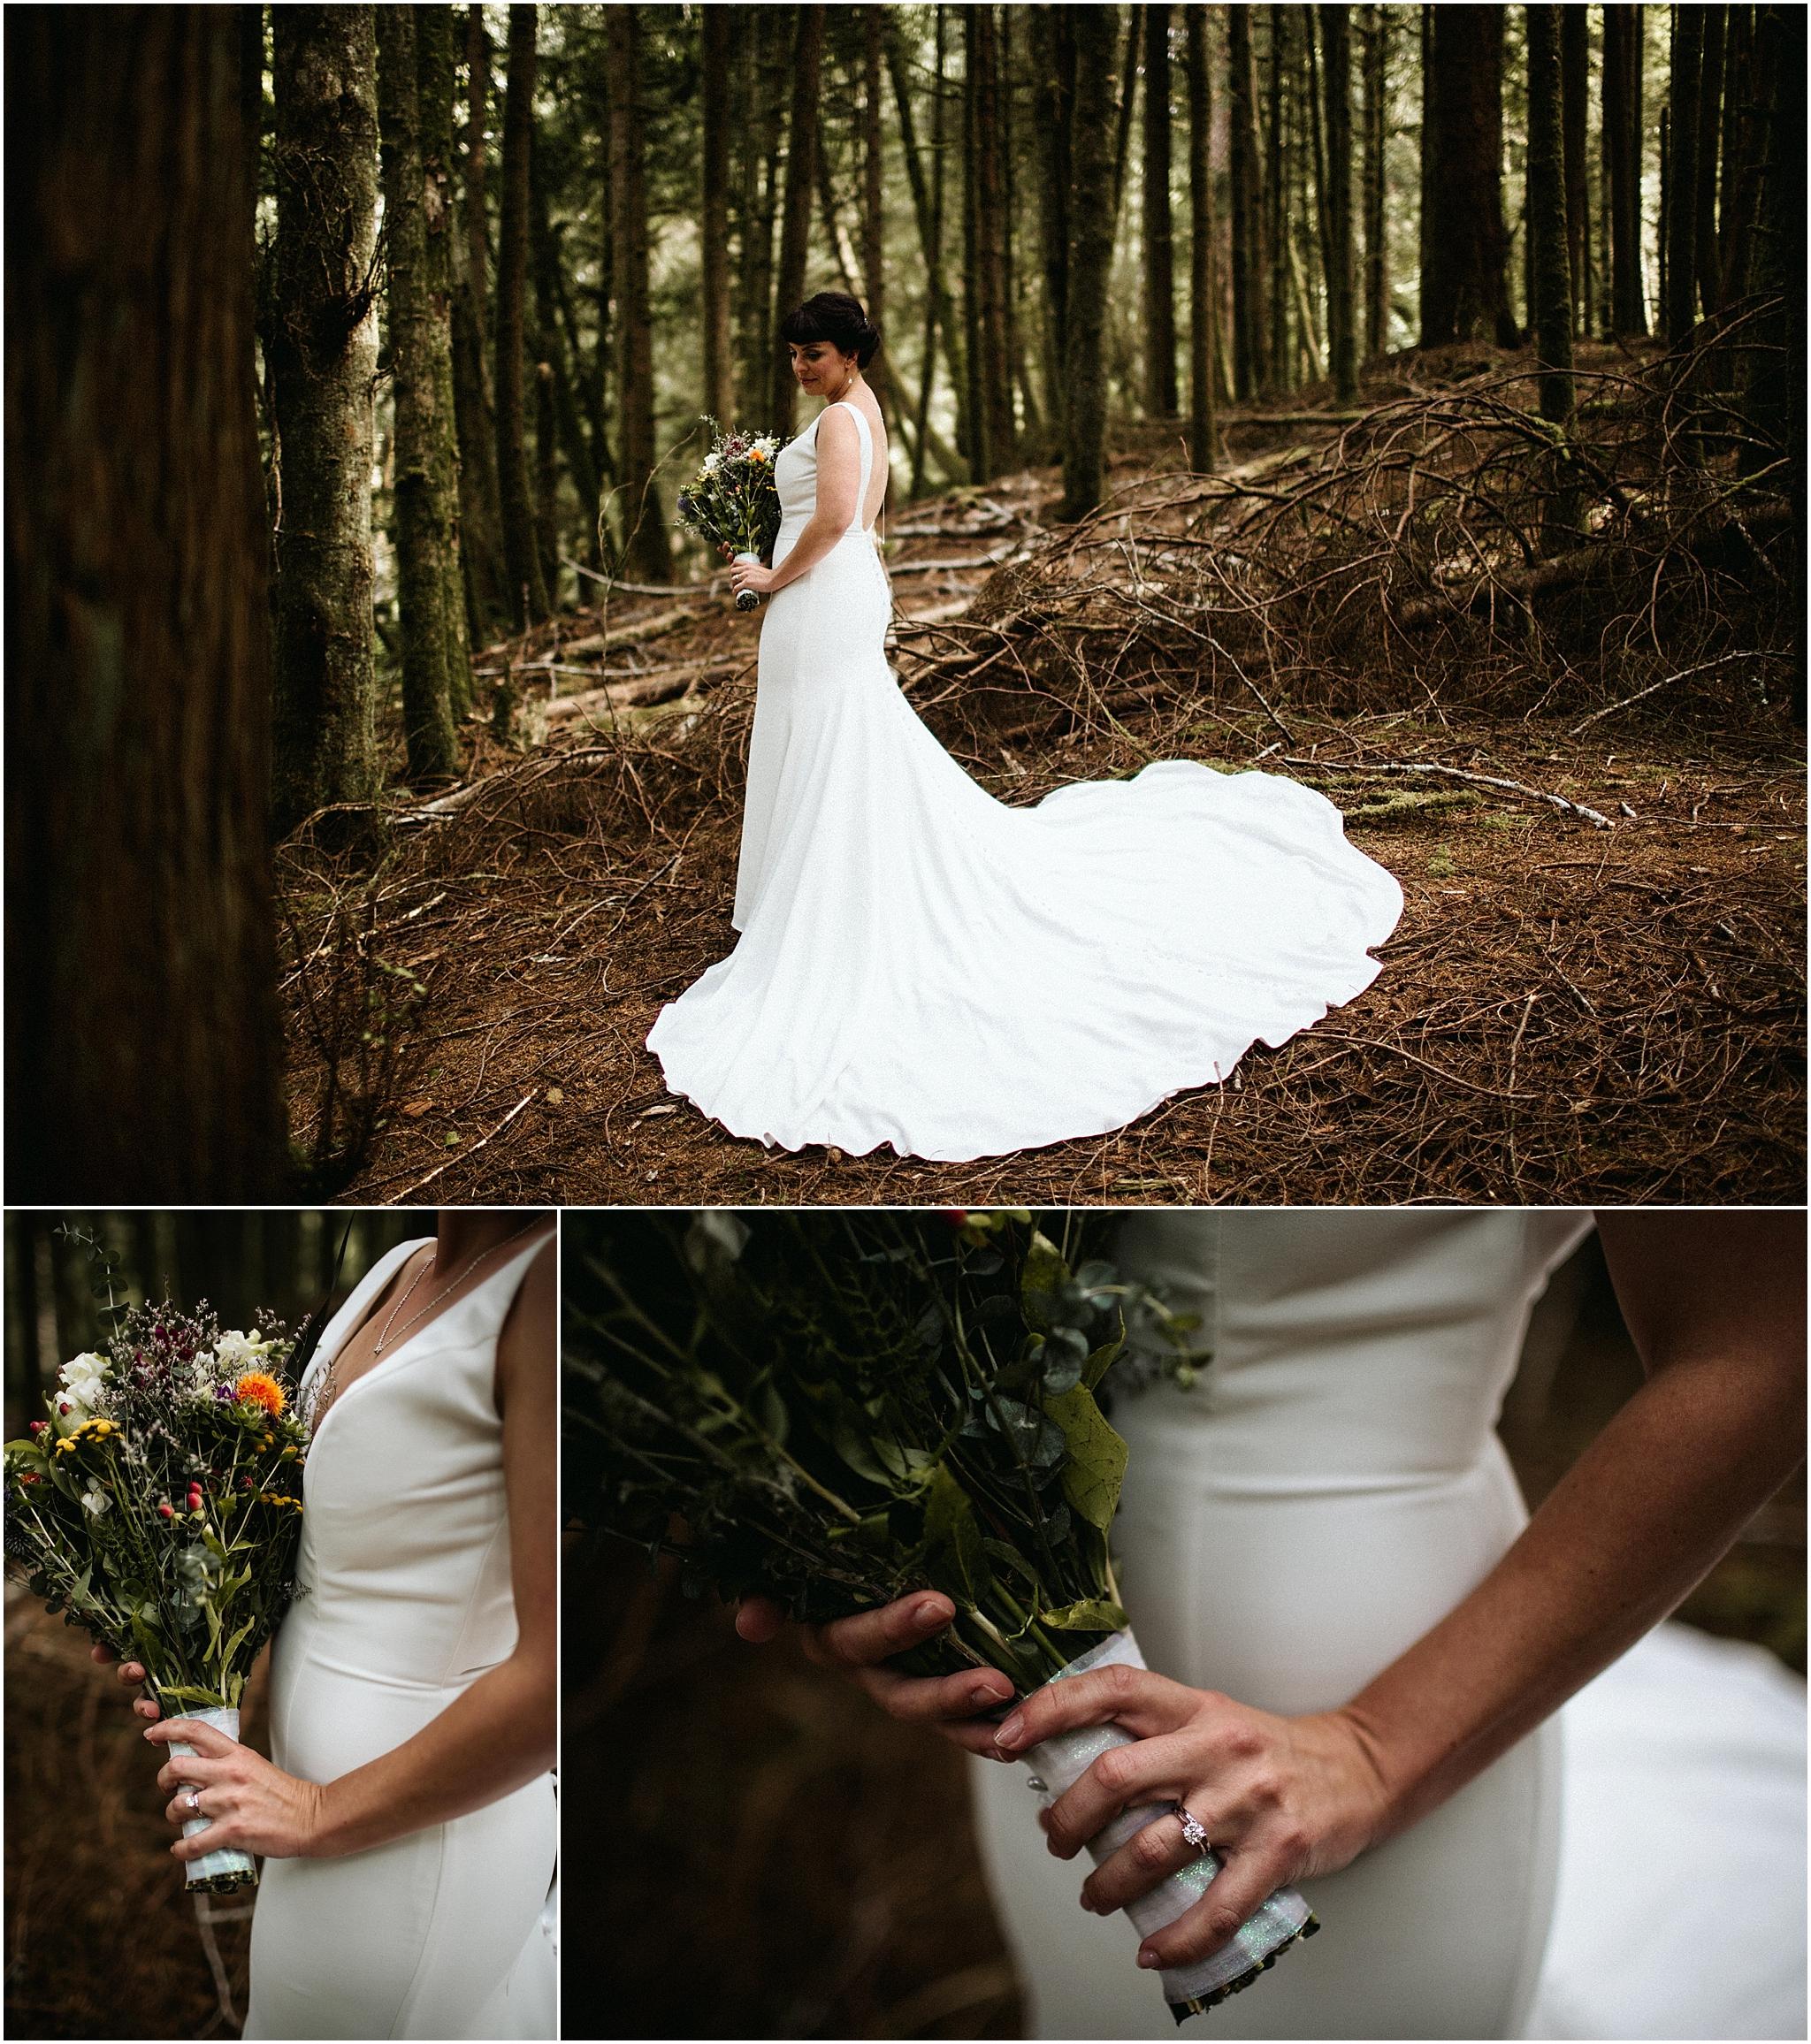 Oregon Coast Intimate Wedding | oregon elopement photographer | oregon elopement11.jpg